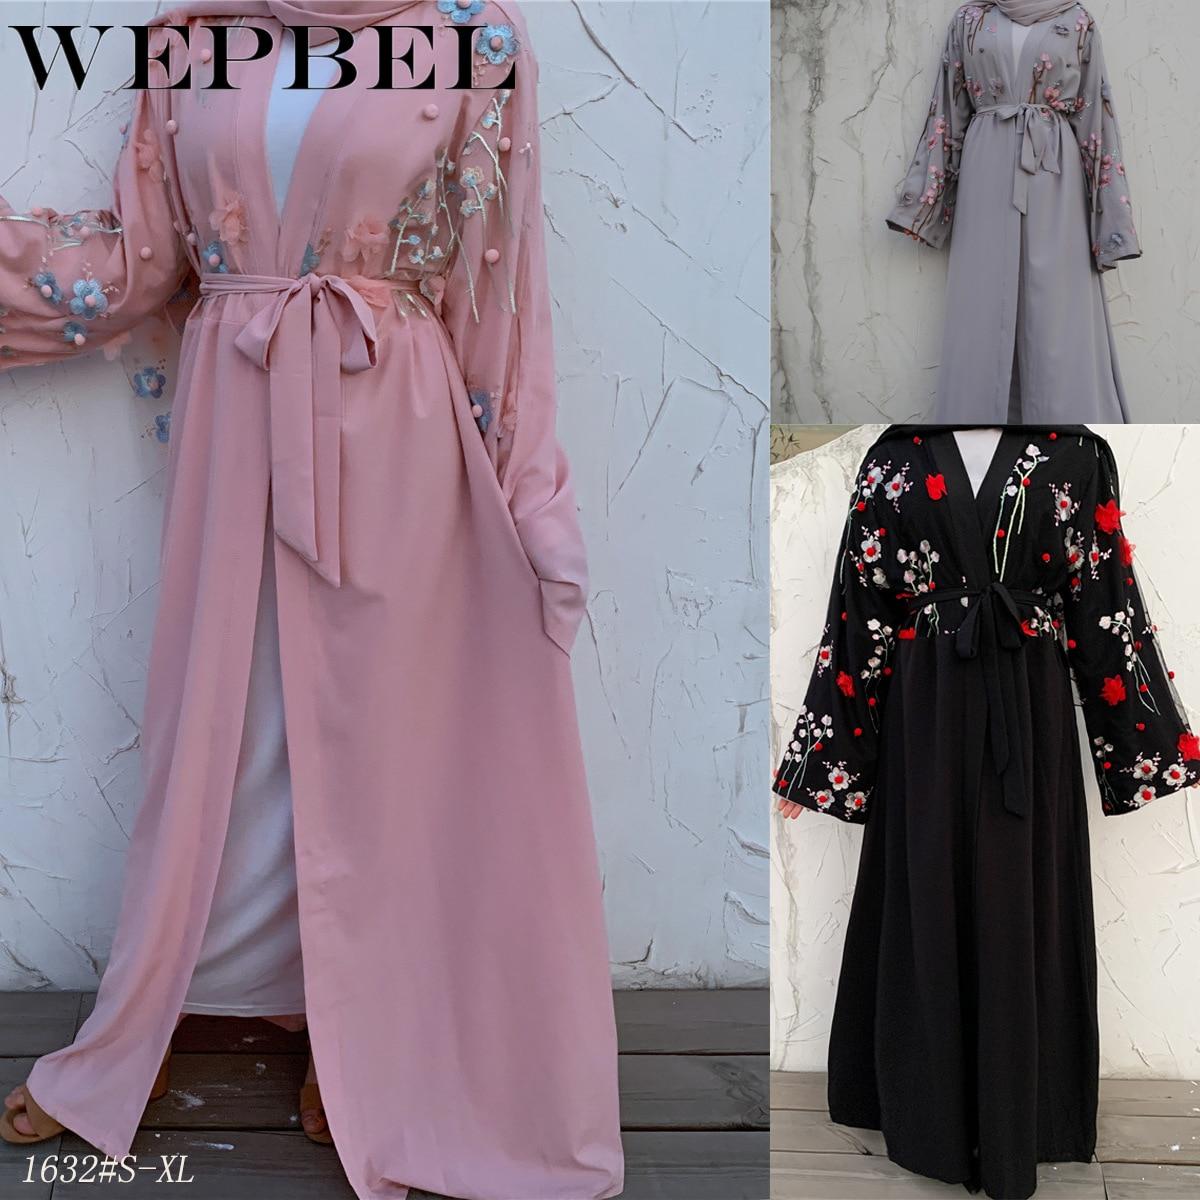 Wepbel vestido musulmán estéreo de malla árabe Abaya suelta de encaje Cardigan turco túnicas Slim Fit manga larga marcaín Kimono Kaftan